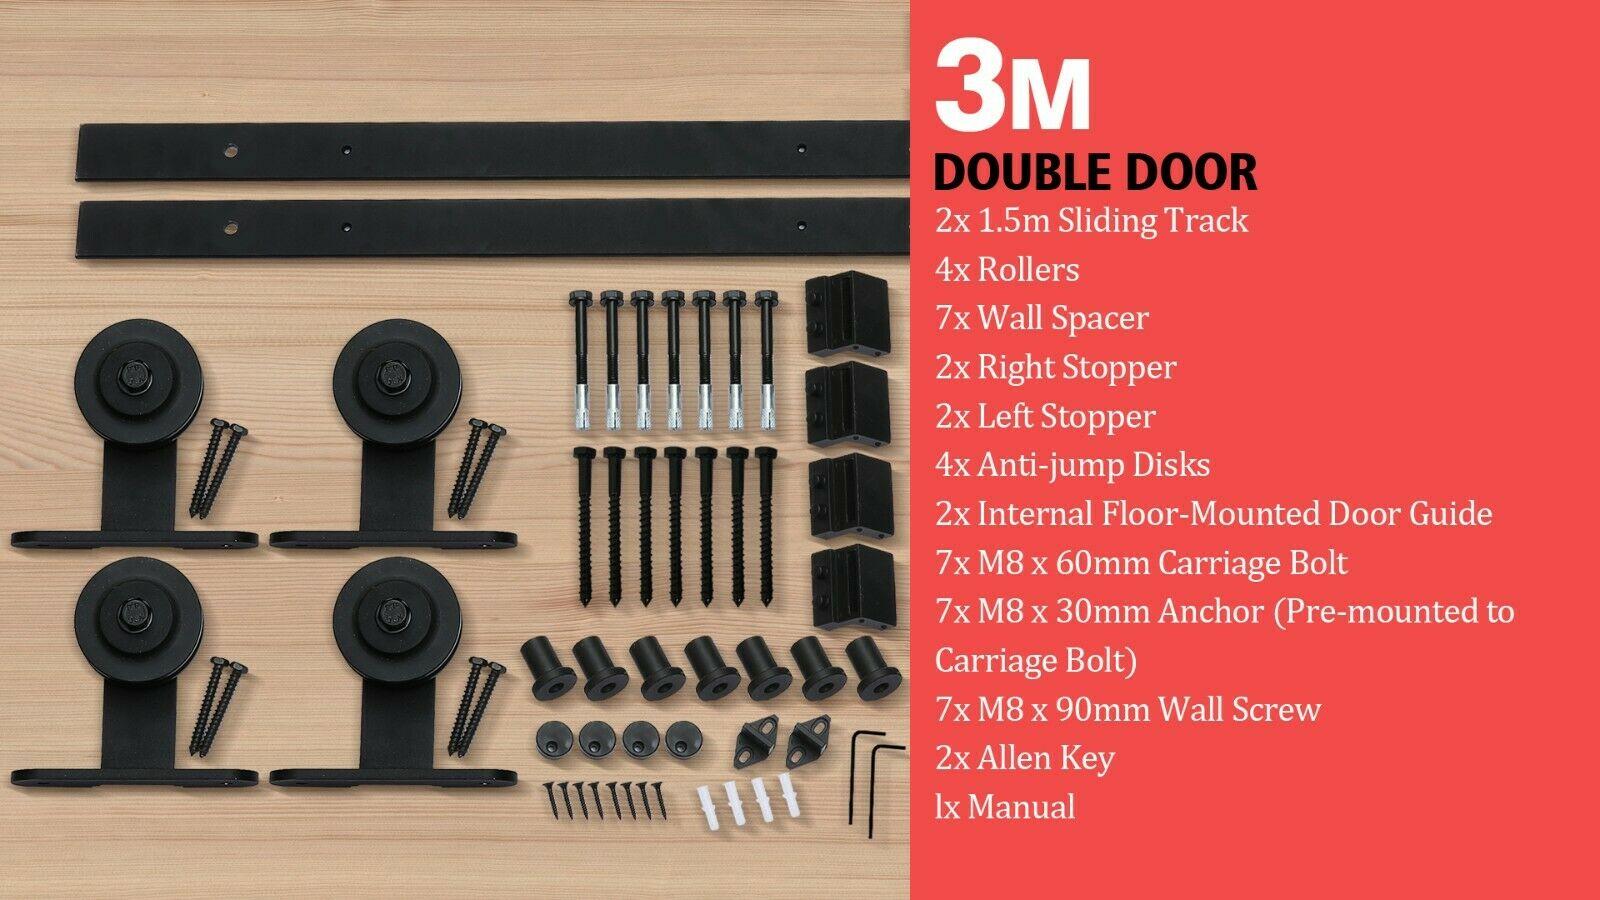 2 44 3 3 6 4m Antique Classic Sliding Barn Double Door